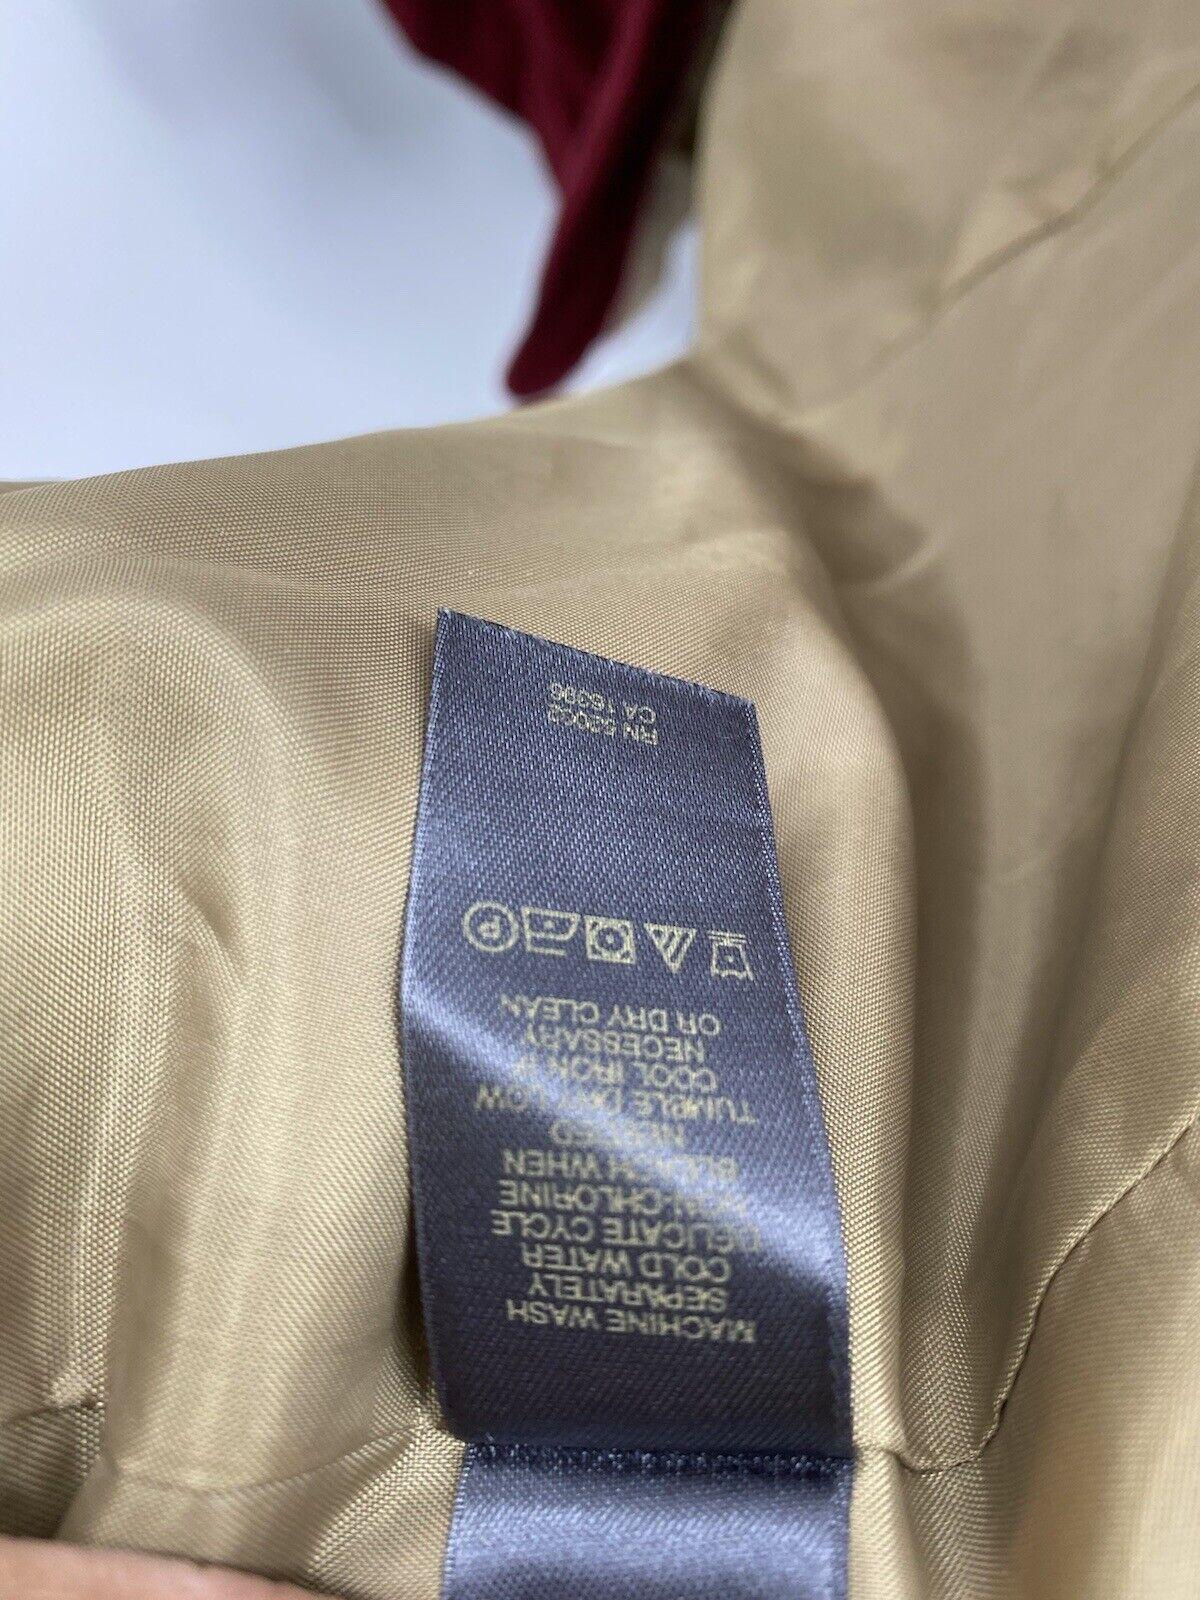 Liz Claiborne Red suede lined jacket/blazer Mediu… - image 7